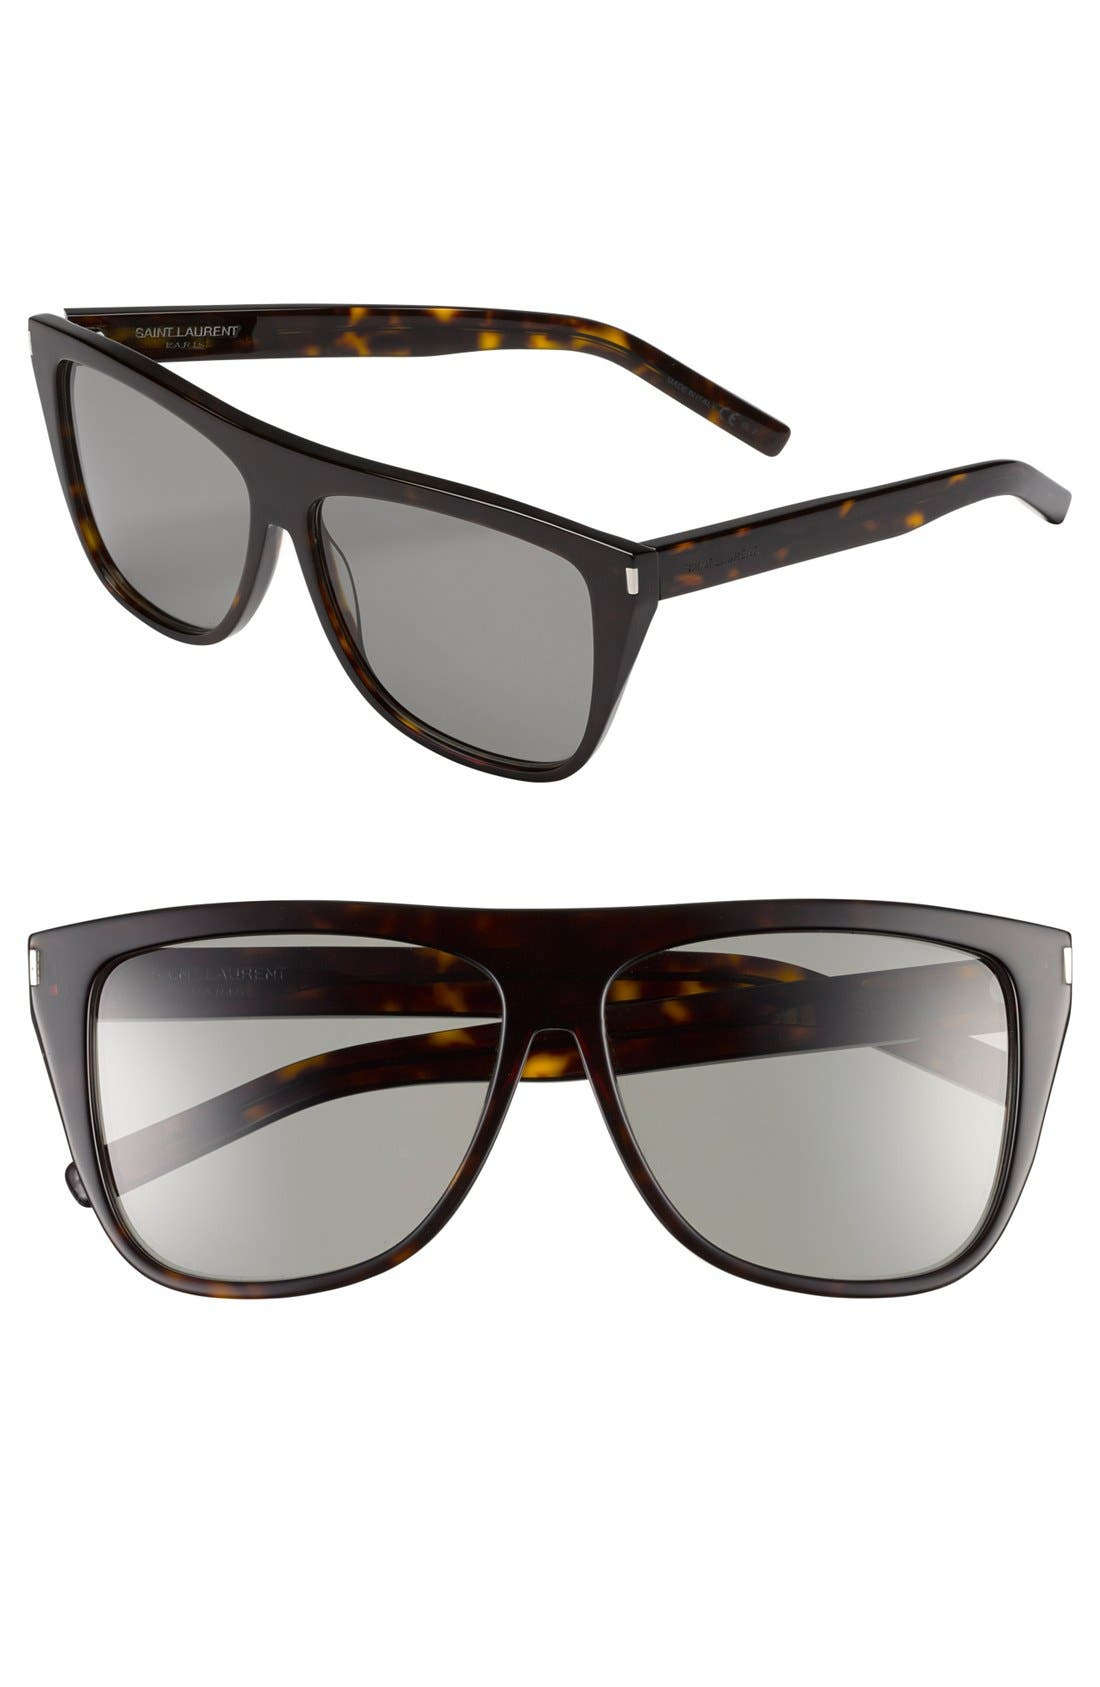 Main Image - Saint Laurent 59mm Sunglasses